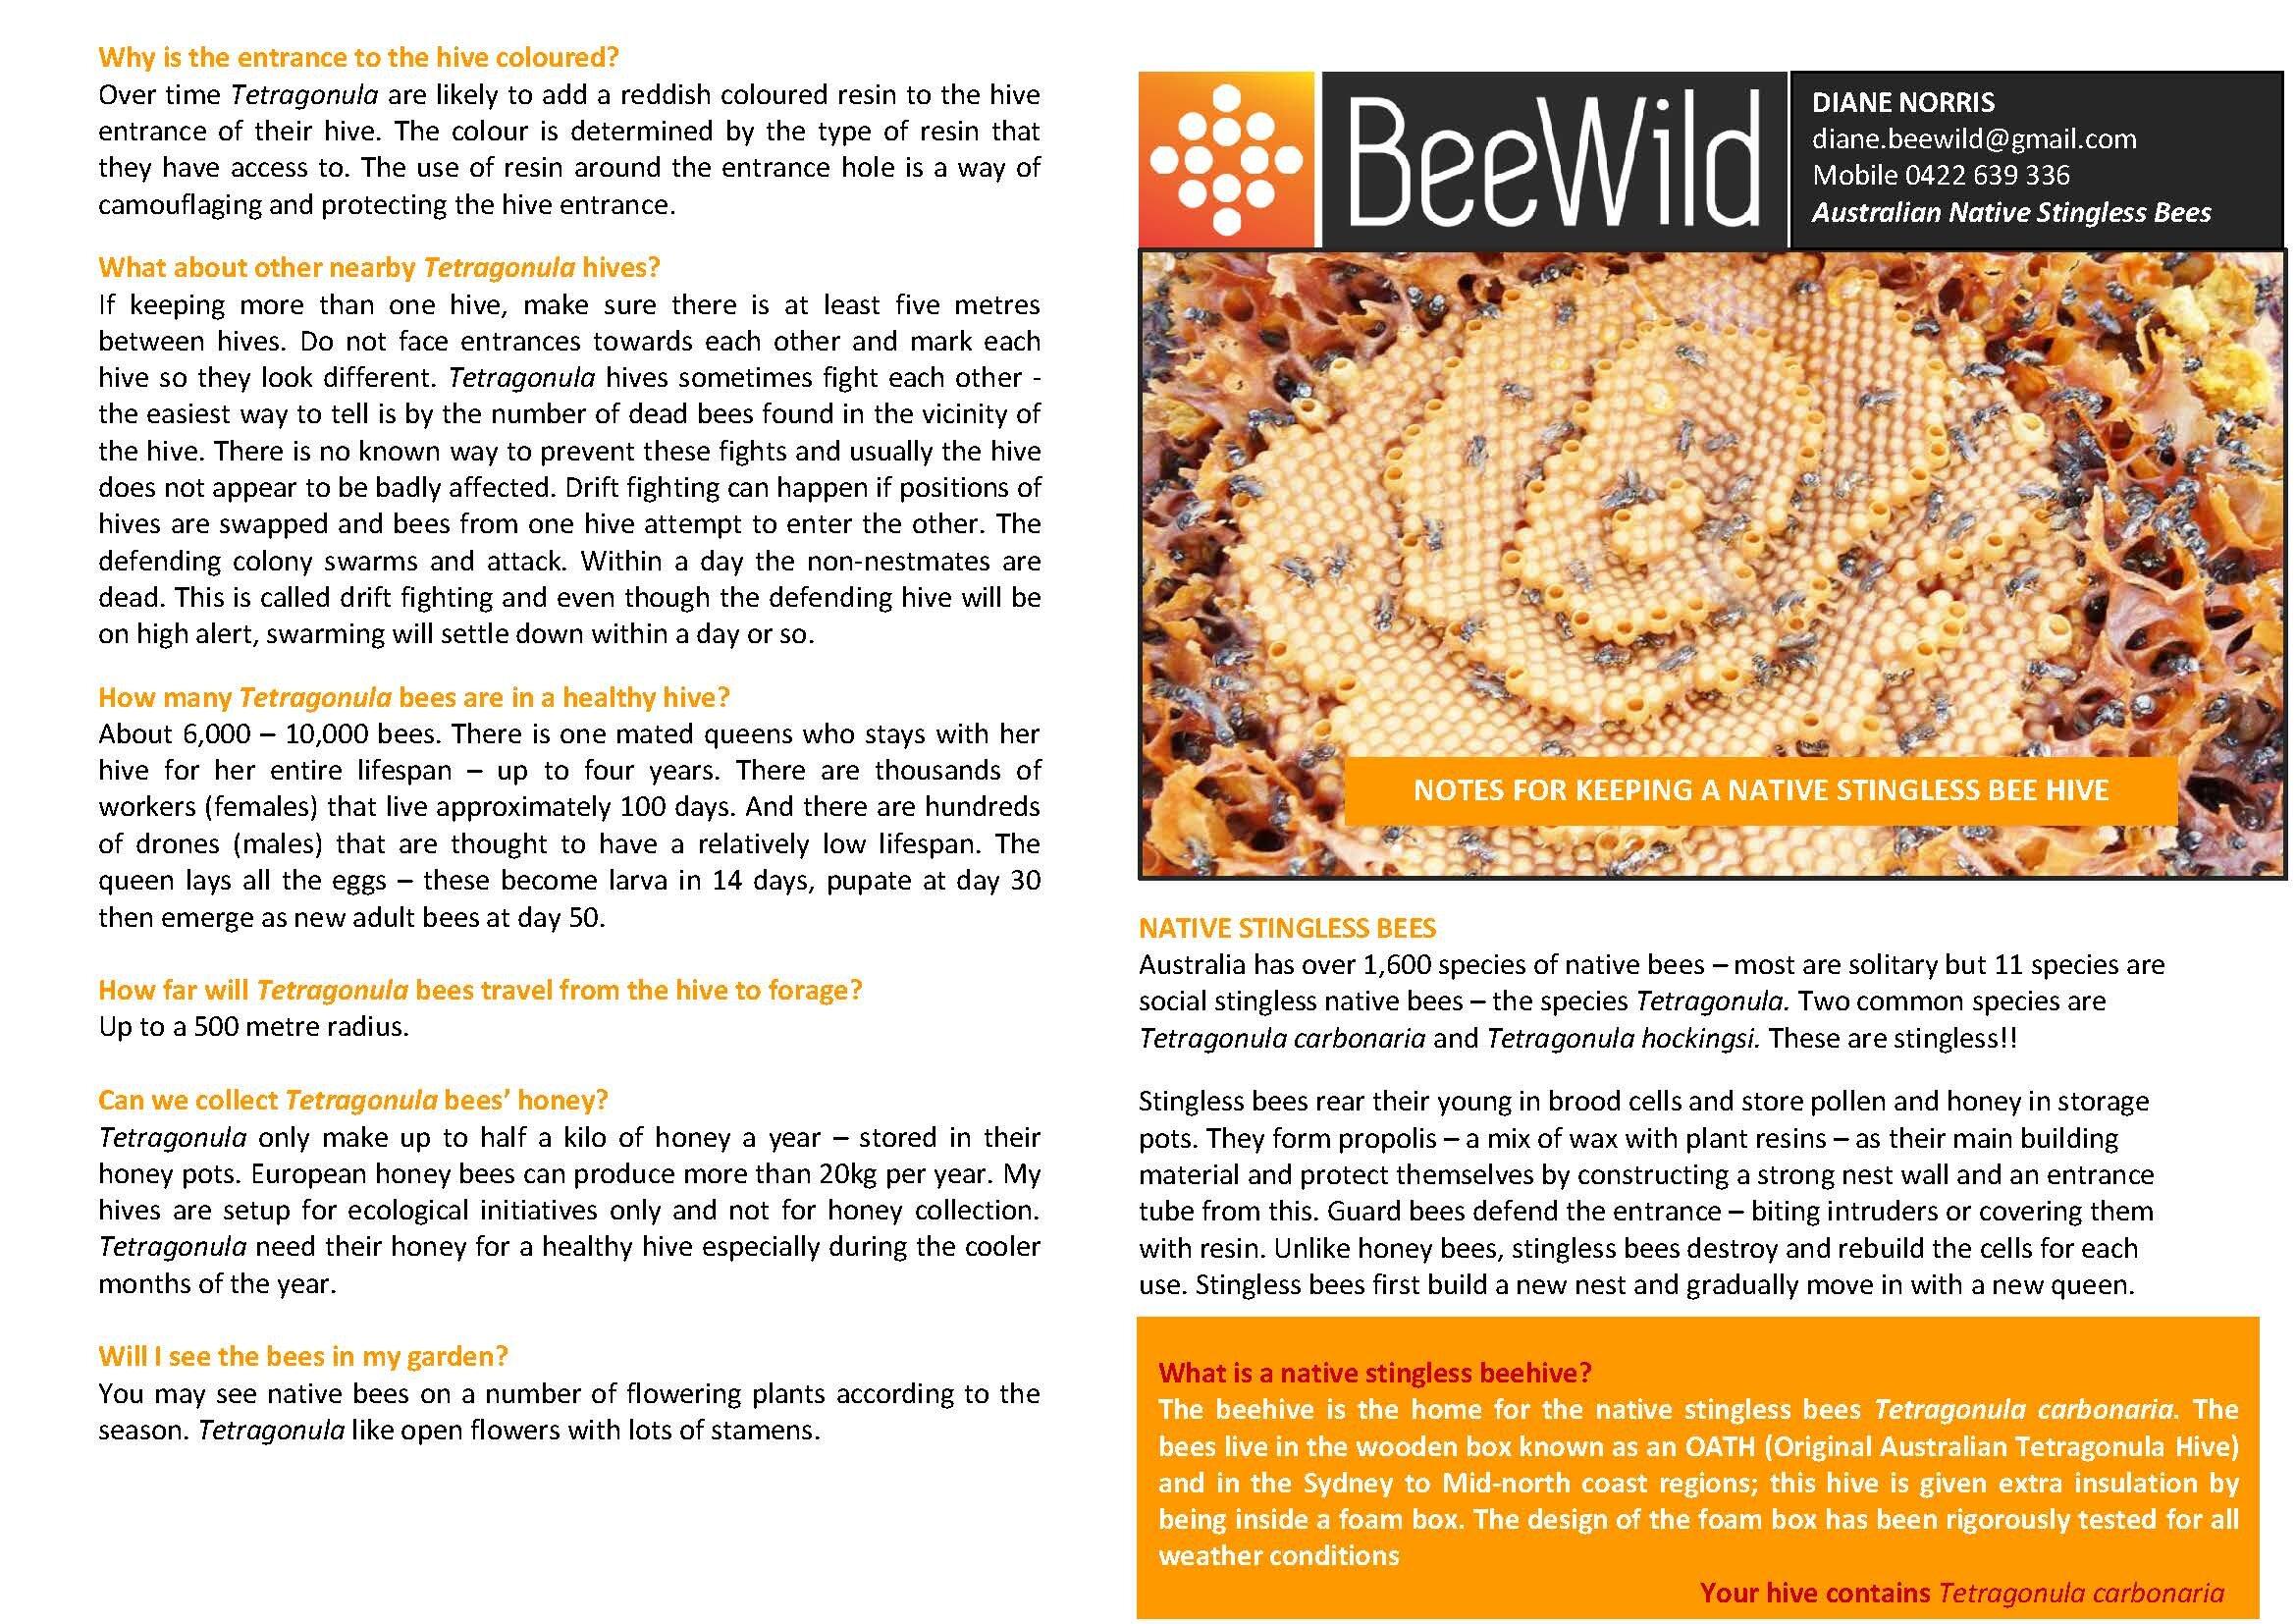 BEEWILD BEE BROCHURE_Page_1.jpg